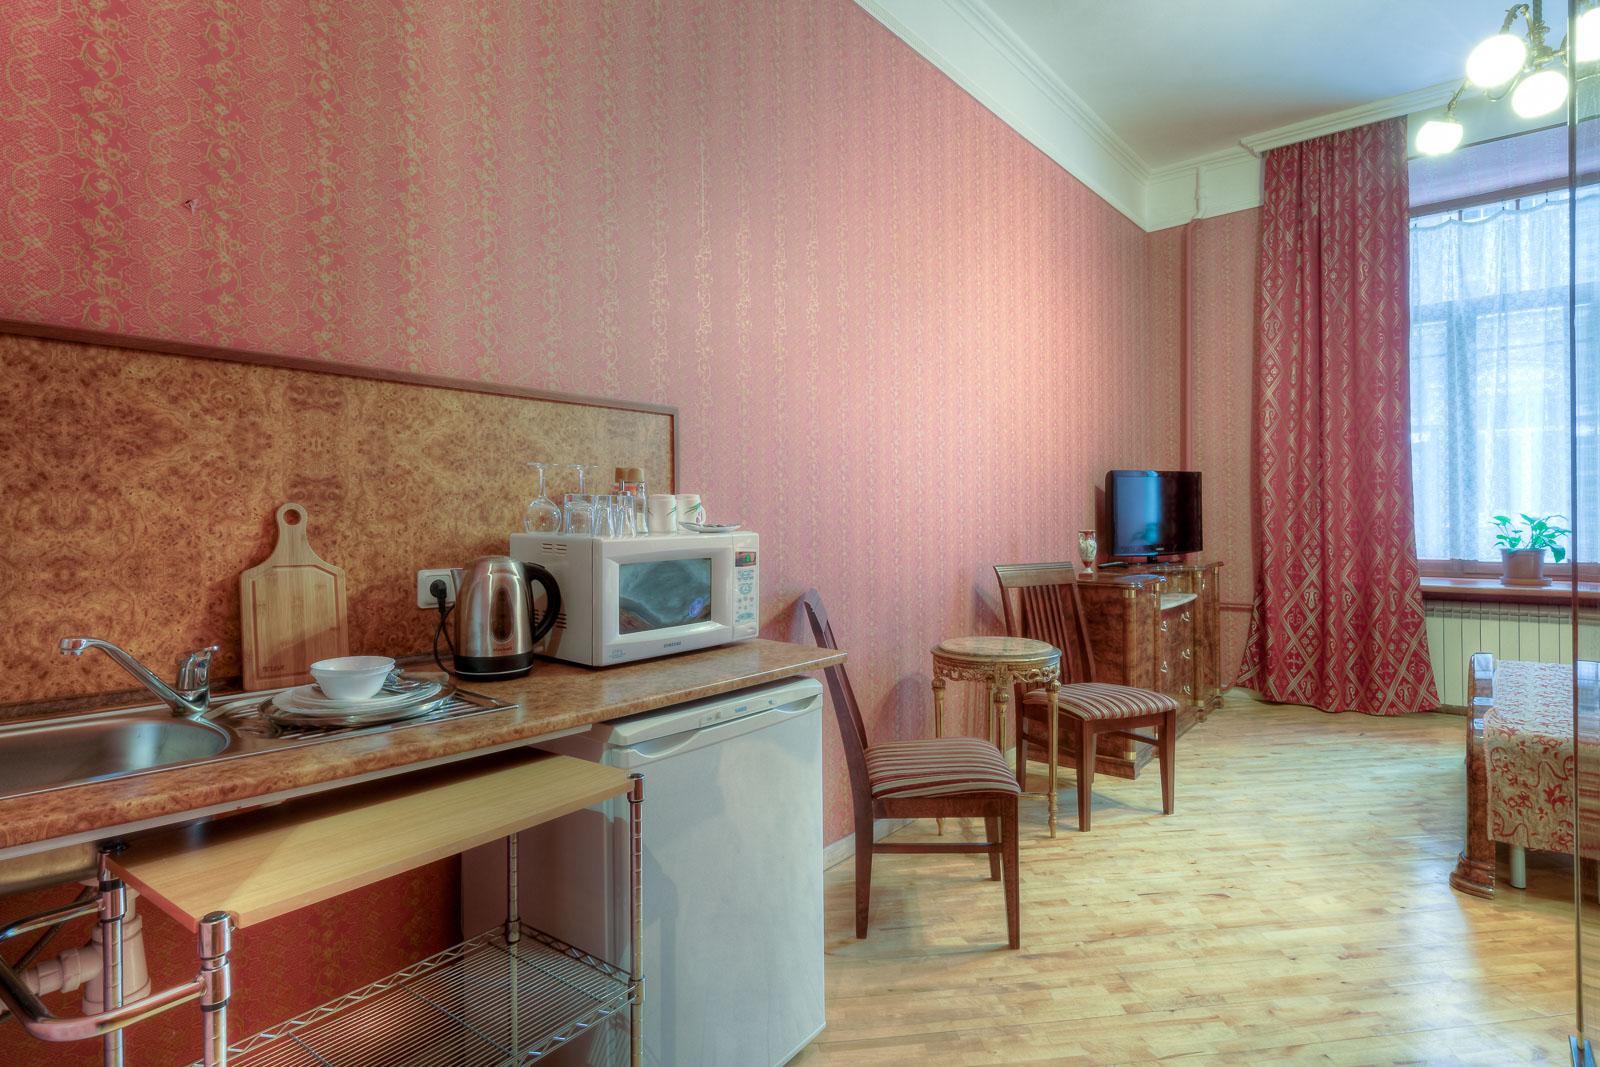 http://city-otel.ru/wp-content/uploads/2018/03/hotel_sity_lux3_3.jpg